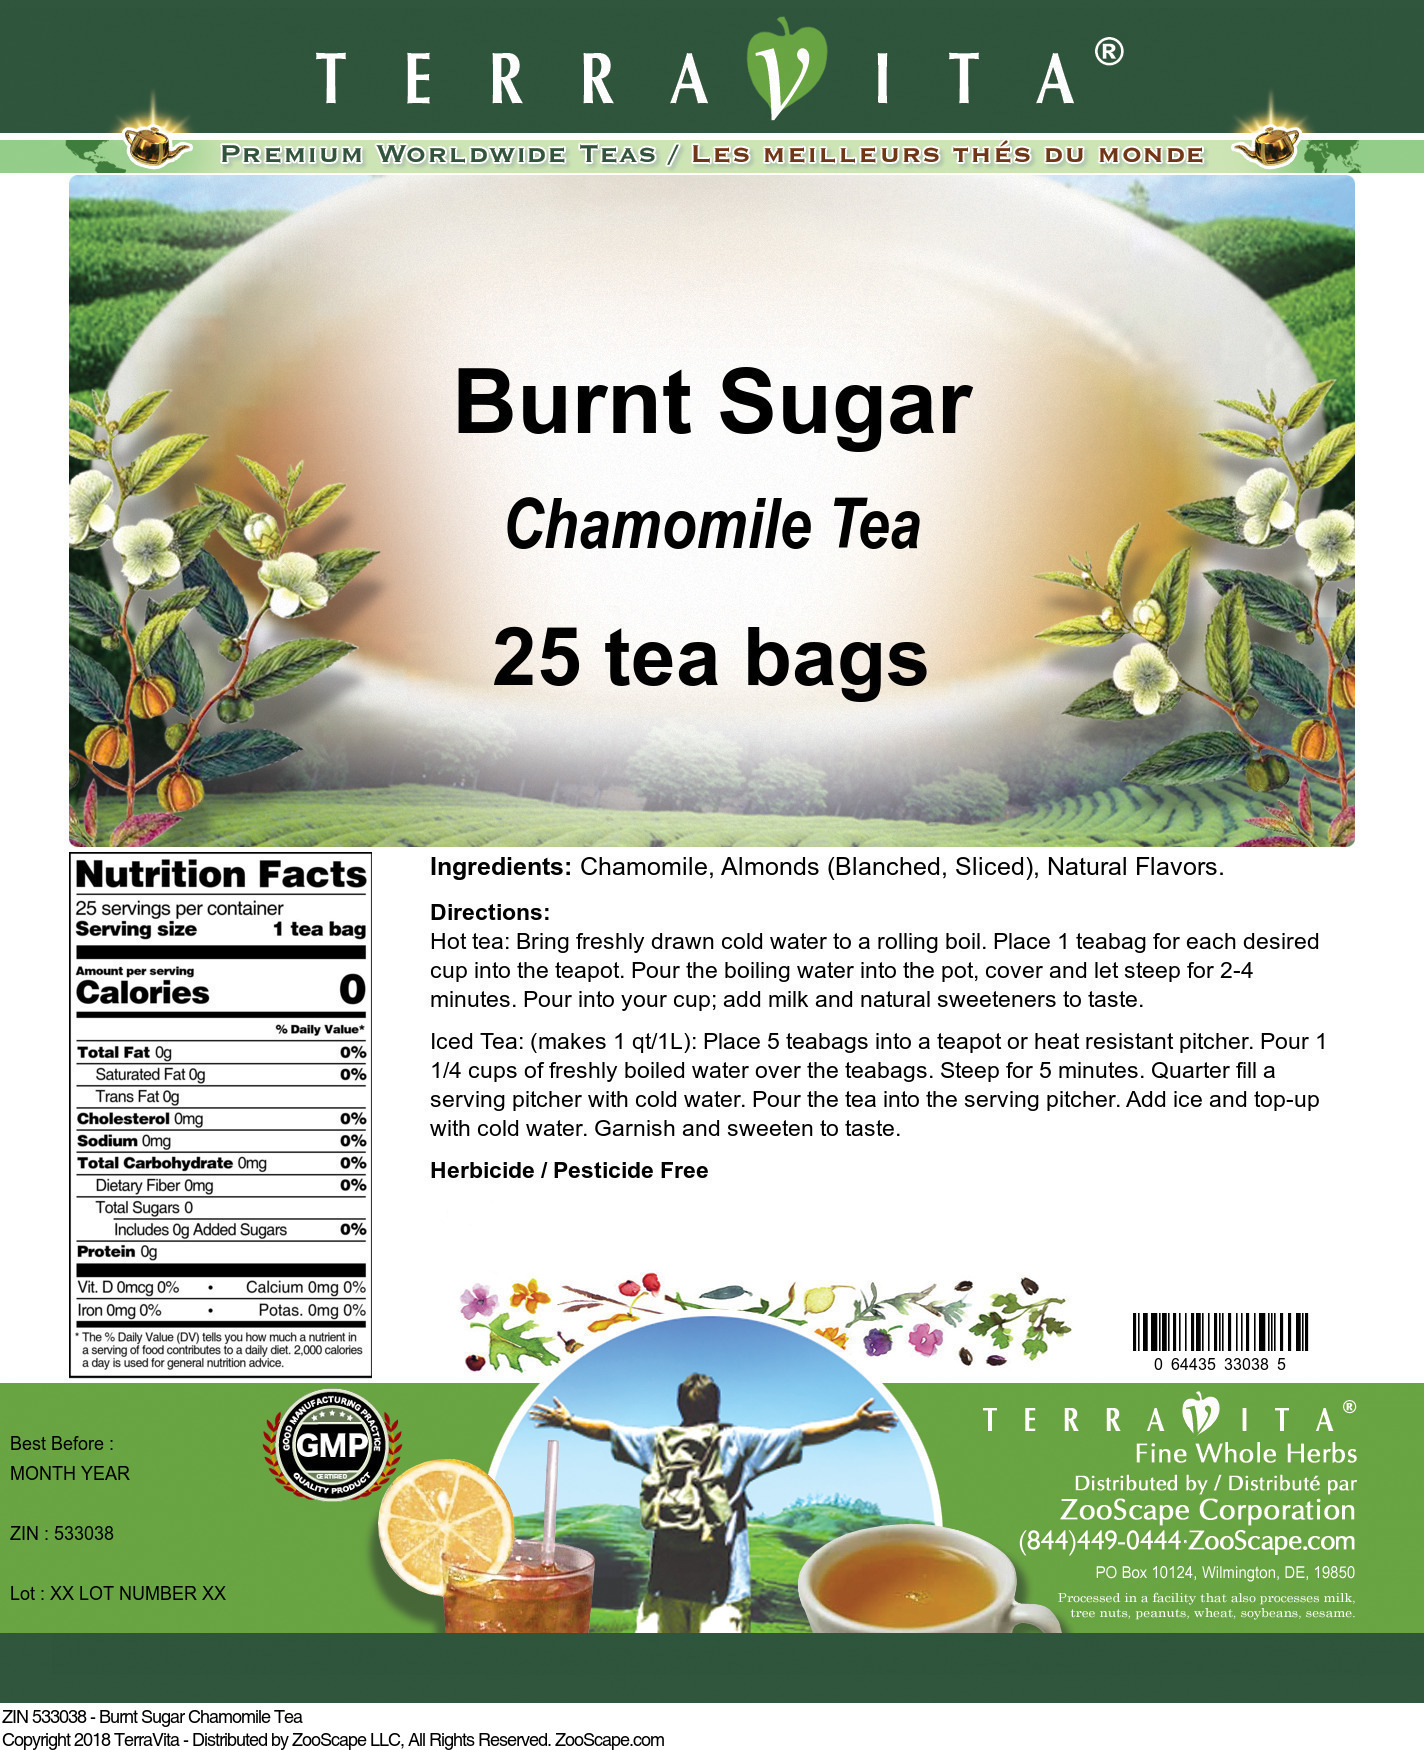 Burnt Sugar Chamomile Tea